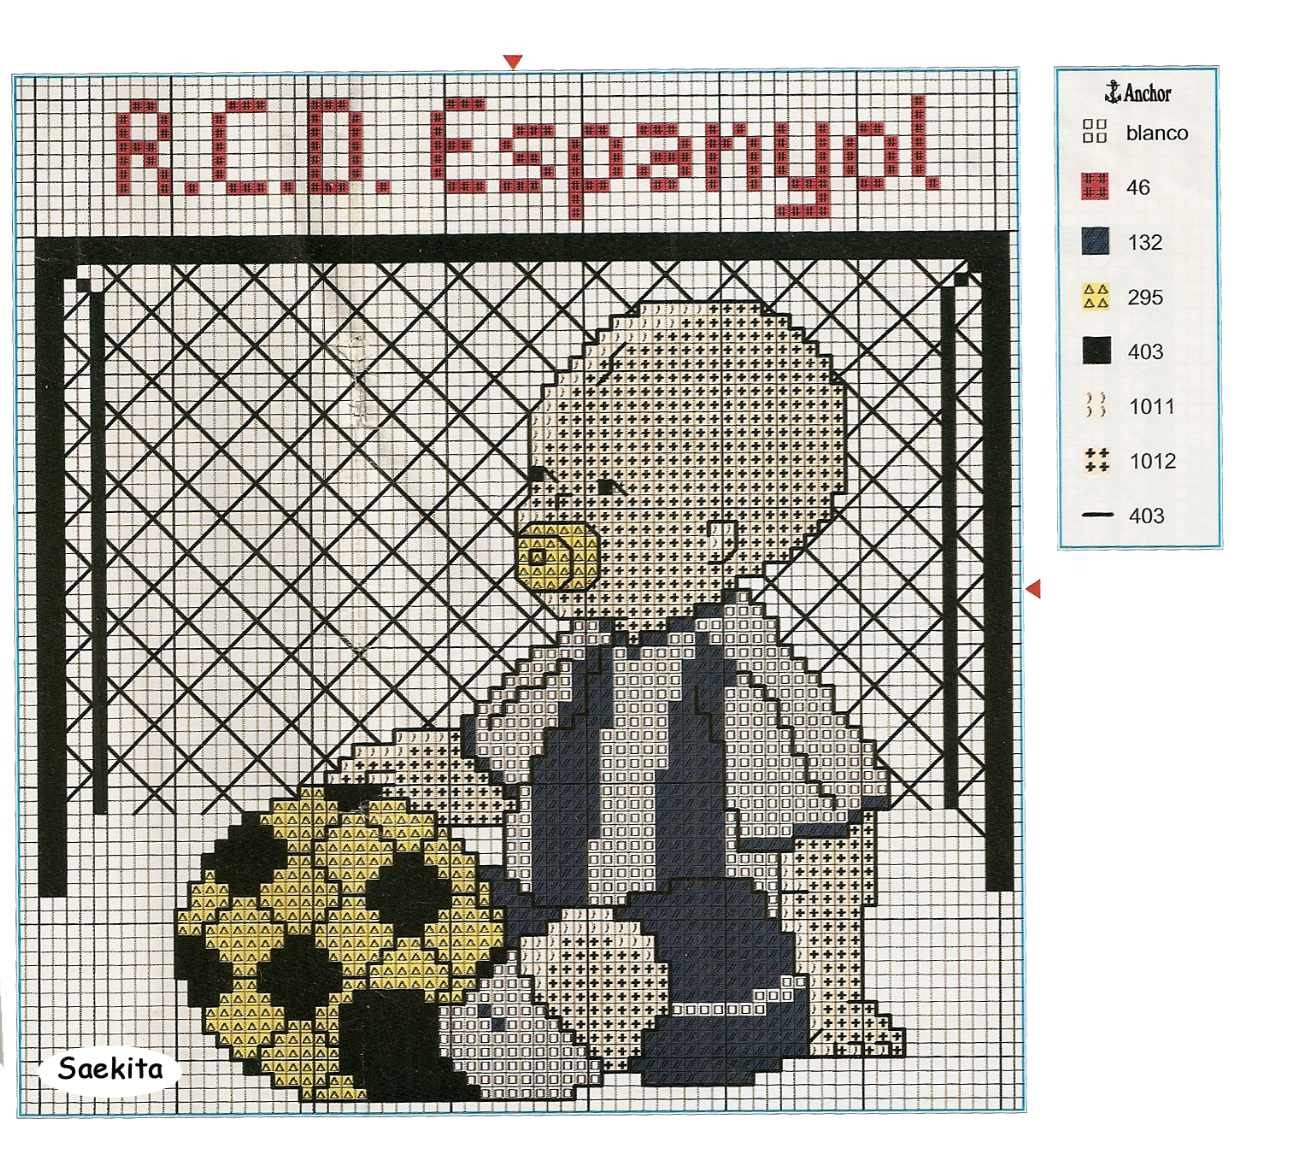 [qqRCD+Espanyol%5B2%5D]